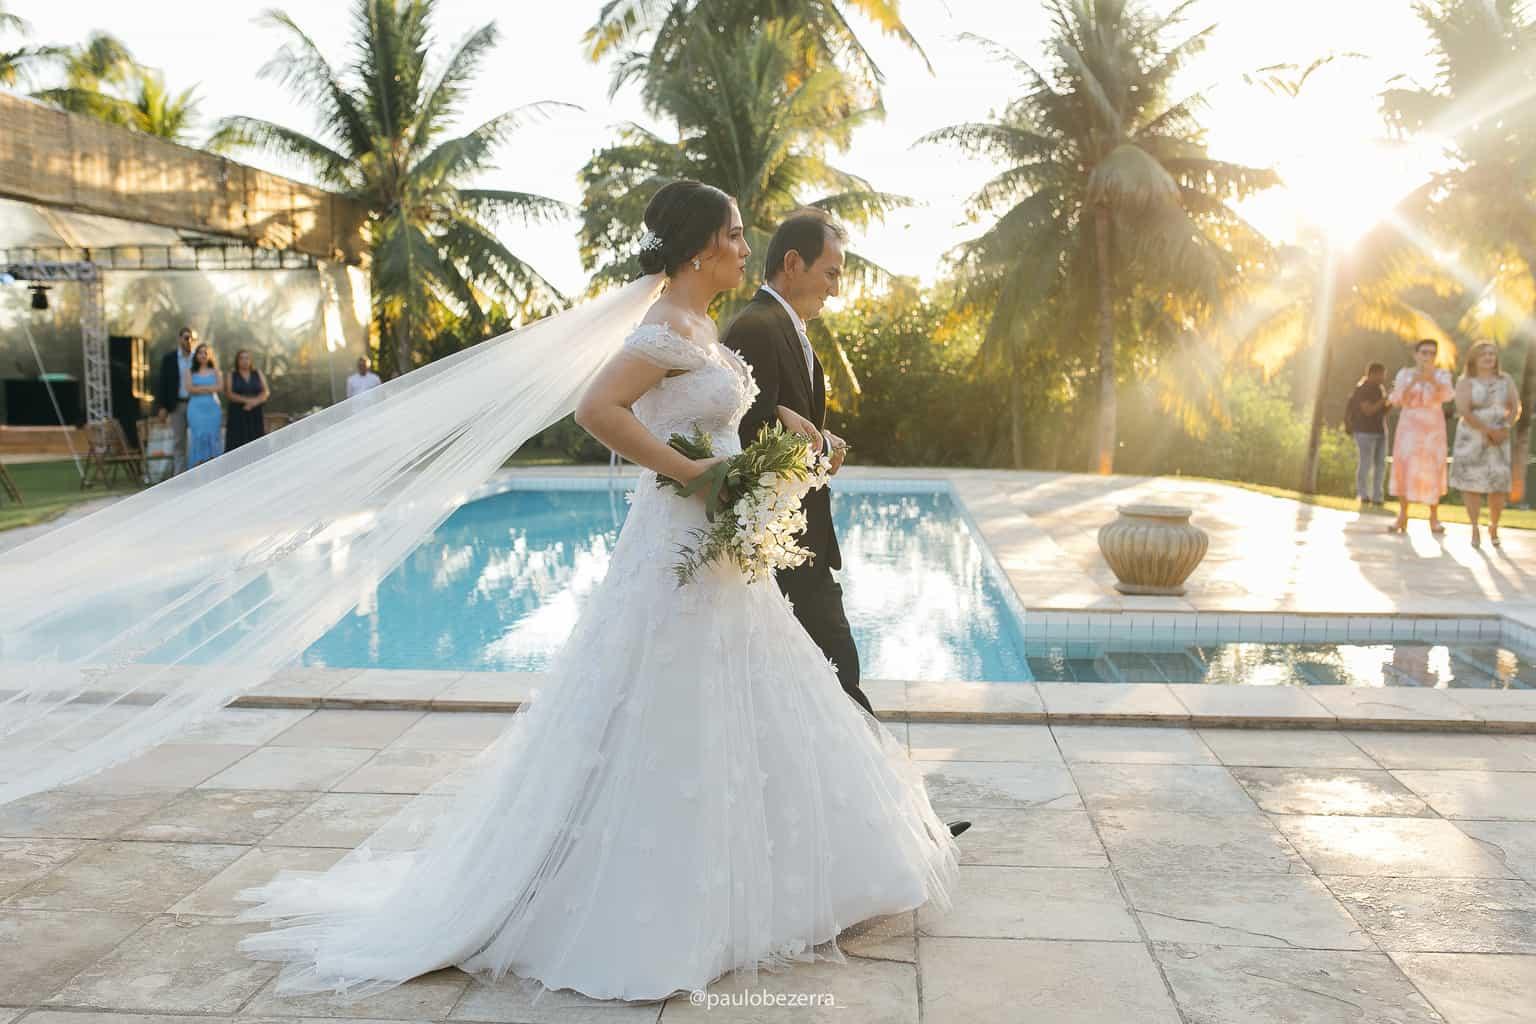 Casamento-Gardenia-e-Marcos-Antonio-Paulo-Bezerra-Joao-Curvelo-Carol-Maiorano0030